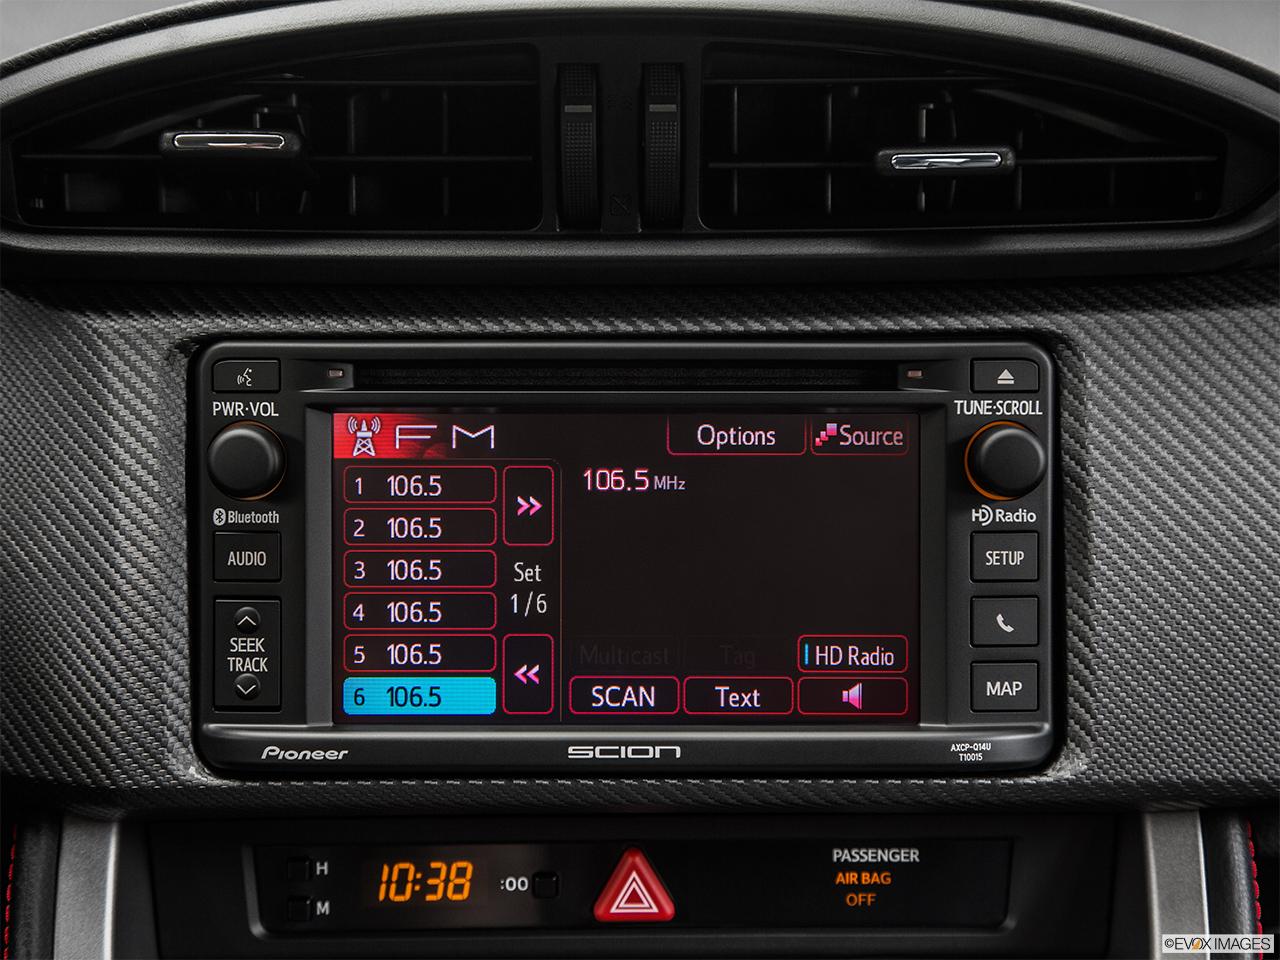 2015 scion fr s manual se coupe front angle view 2015 scion rh carnow com scion frs pioneer radio manual 2013 Scion FR -S